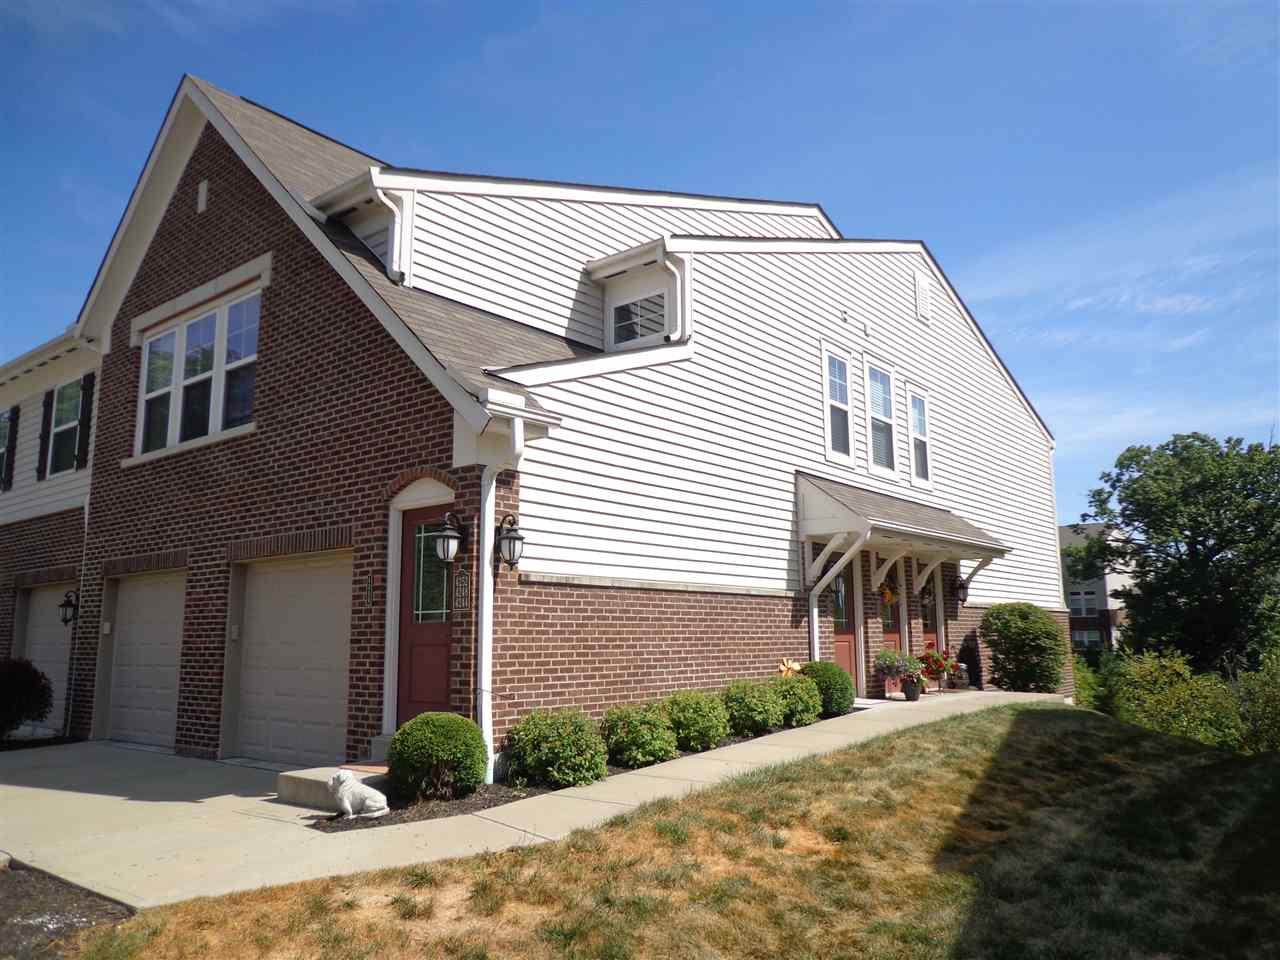 Photo 2 for 4248 Country Mill Rdg Burlington, KY 41005